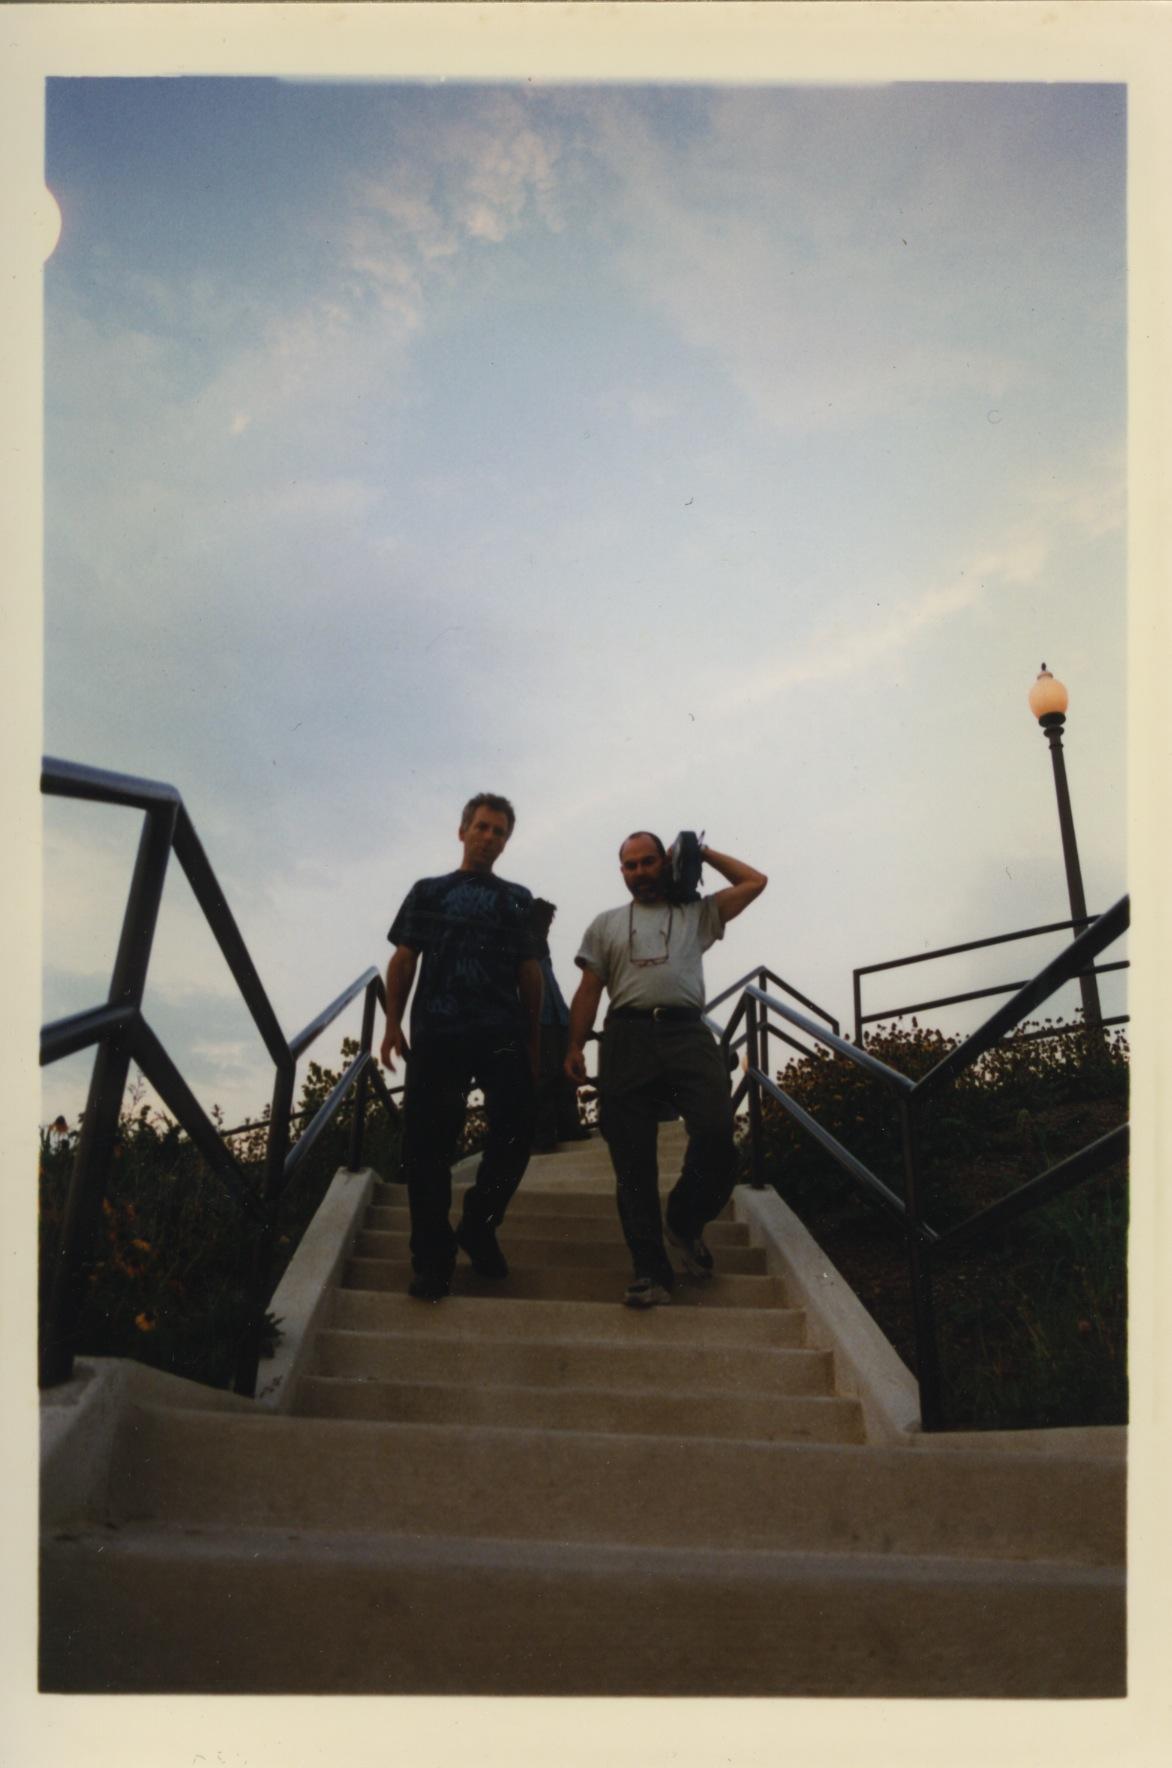 Marc and Ben